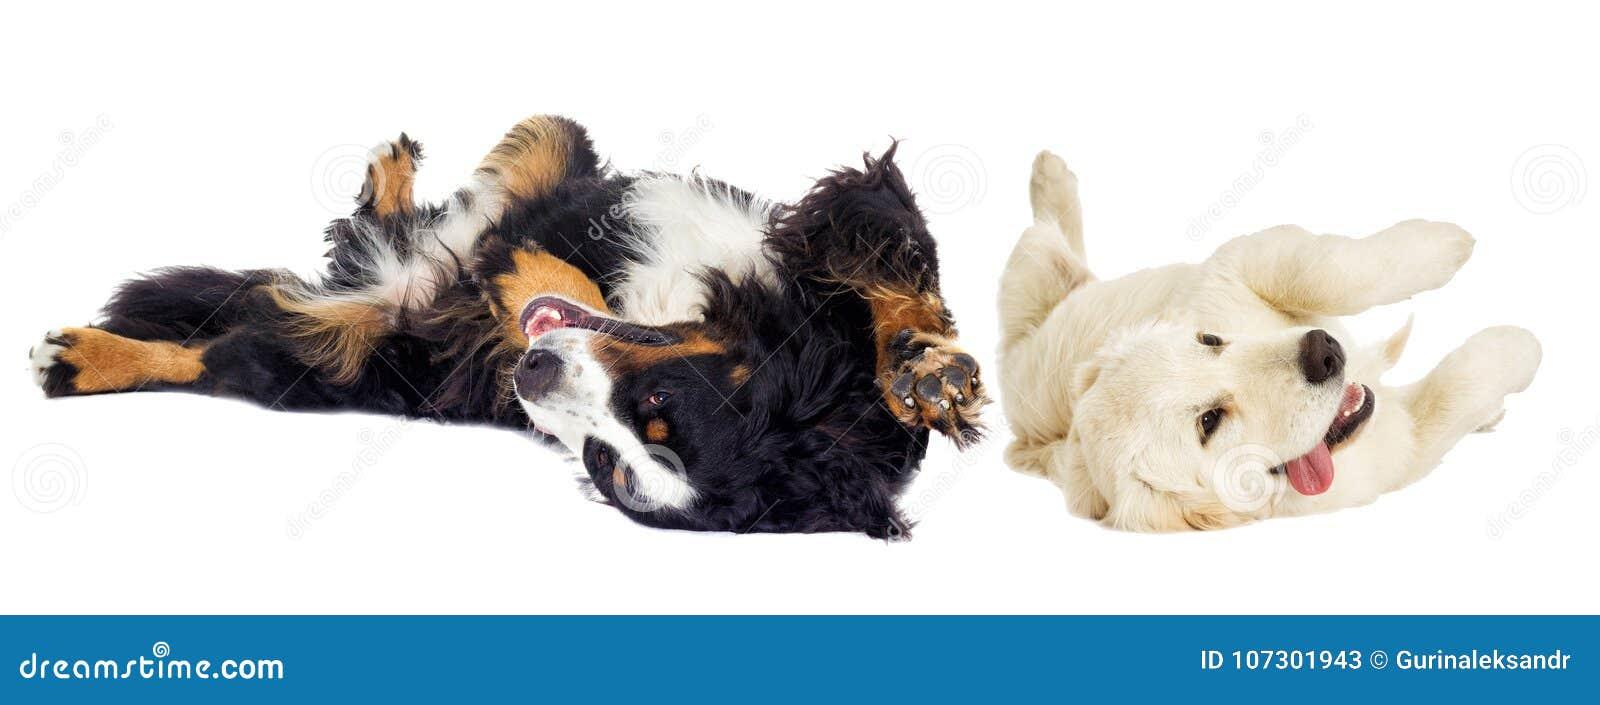 Golden retriever dog and the Bernese Mountain Dog